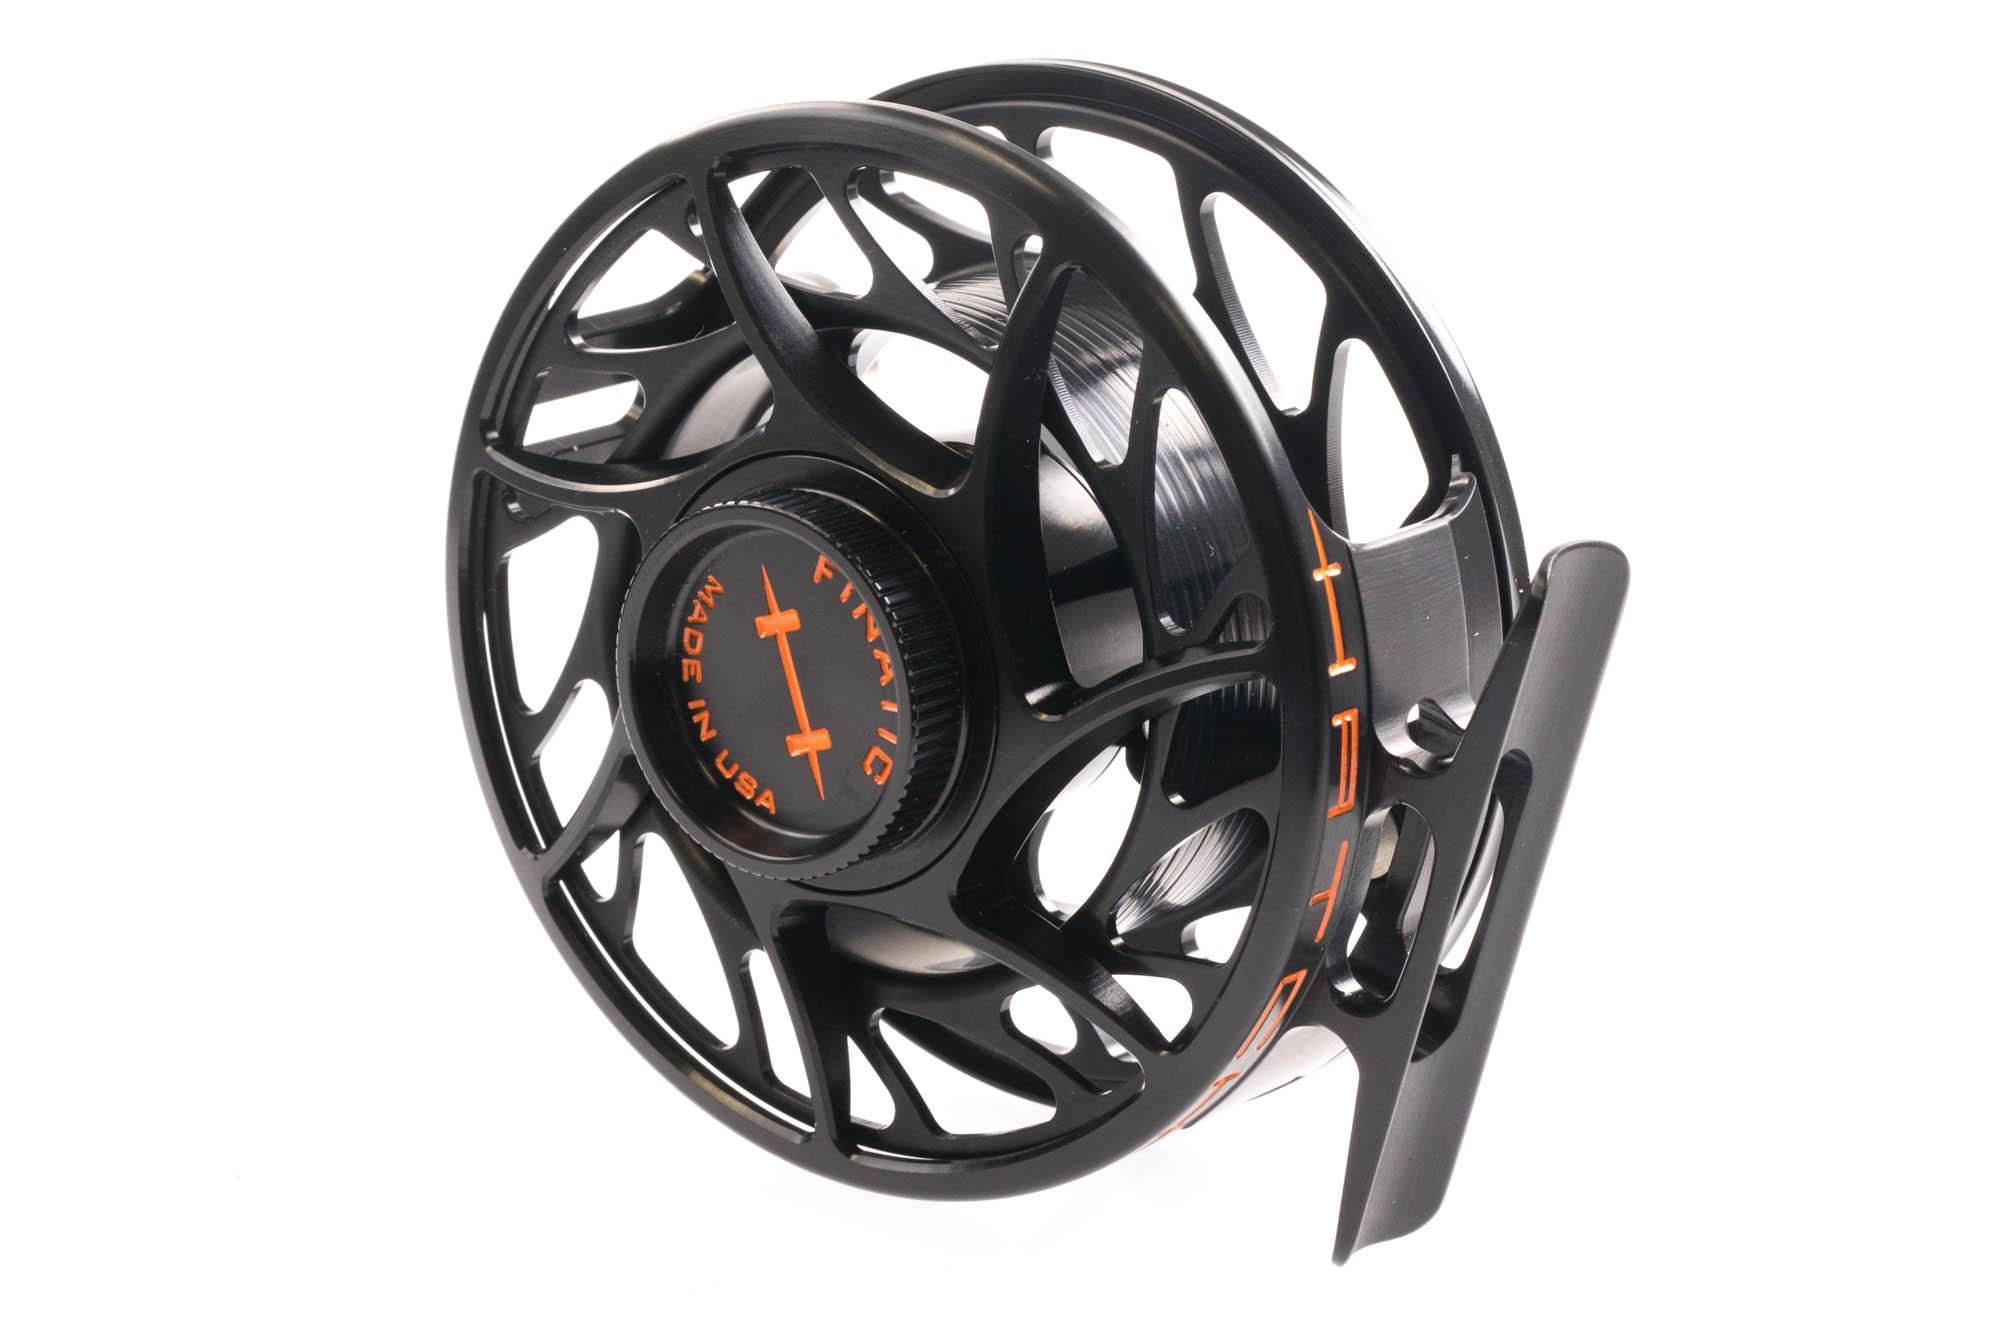 Hatch Finatic Fly Reel - Mid Arbor 35